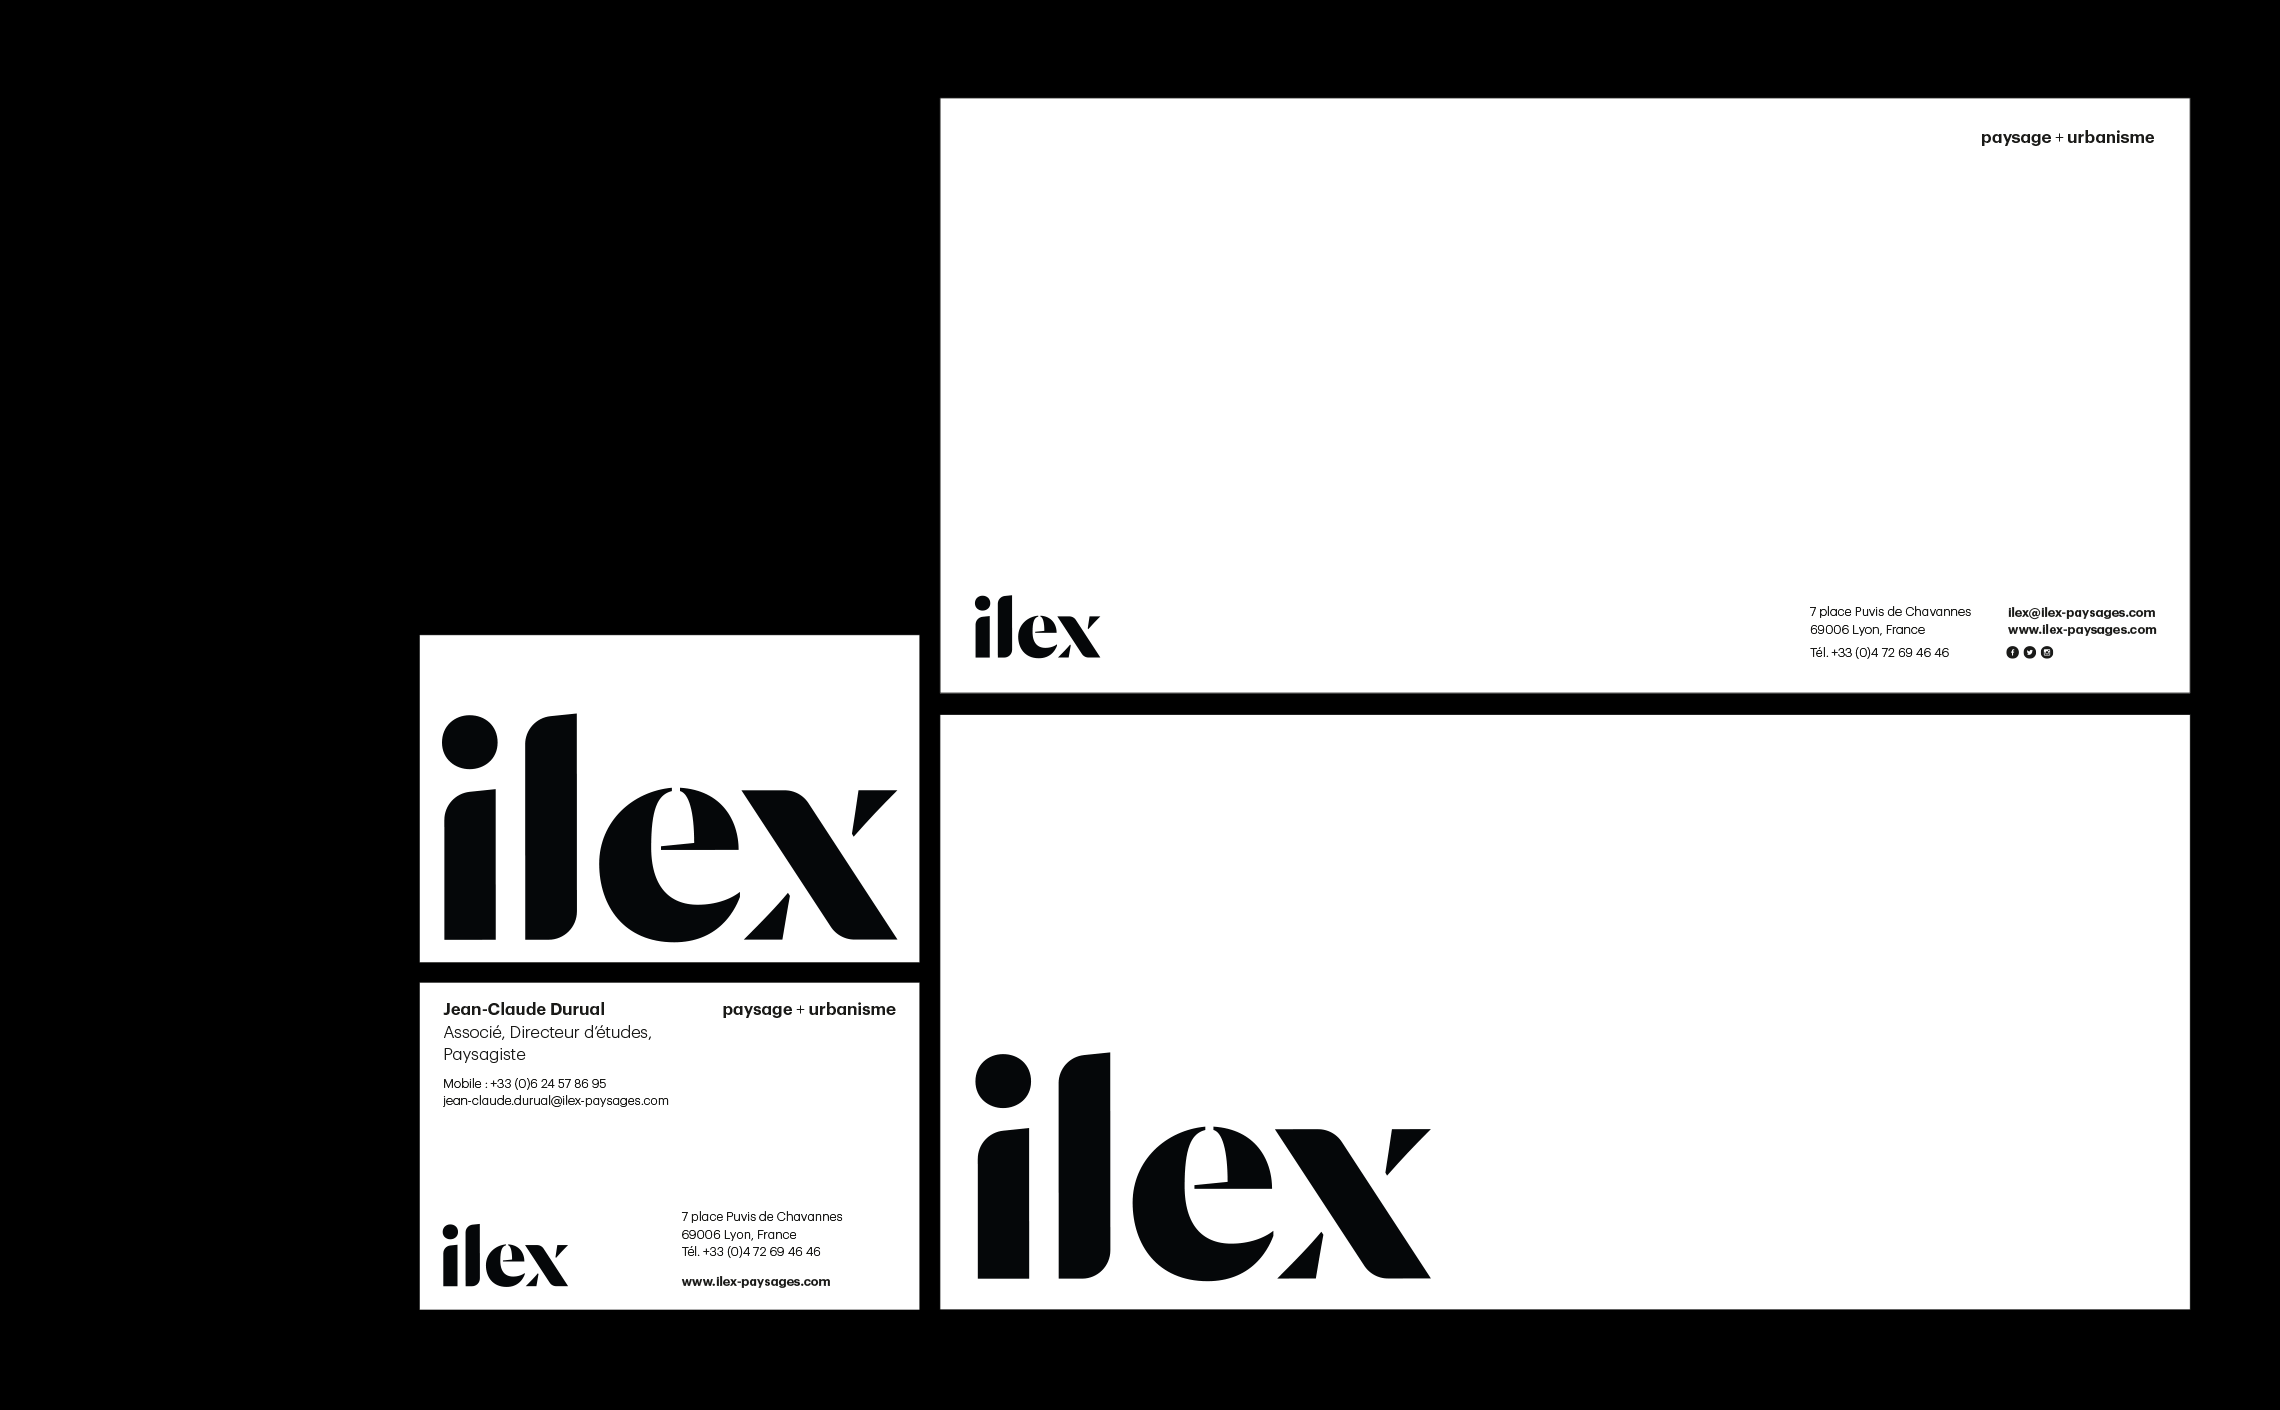 Ilex-images-web02